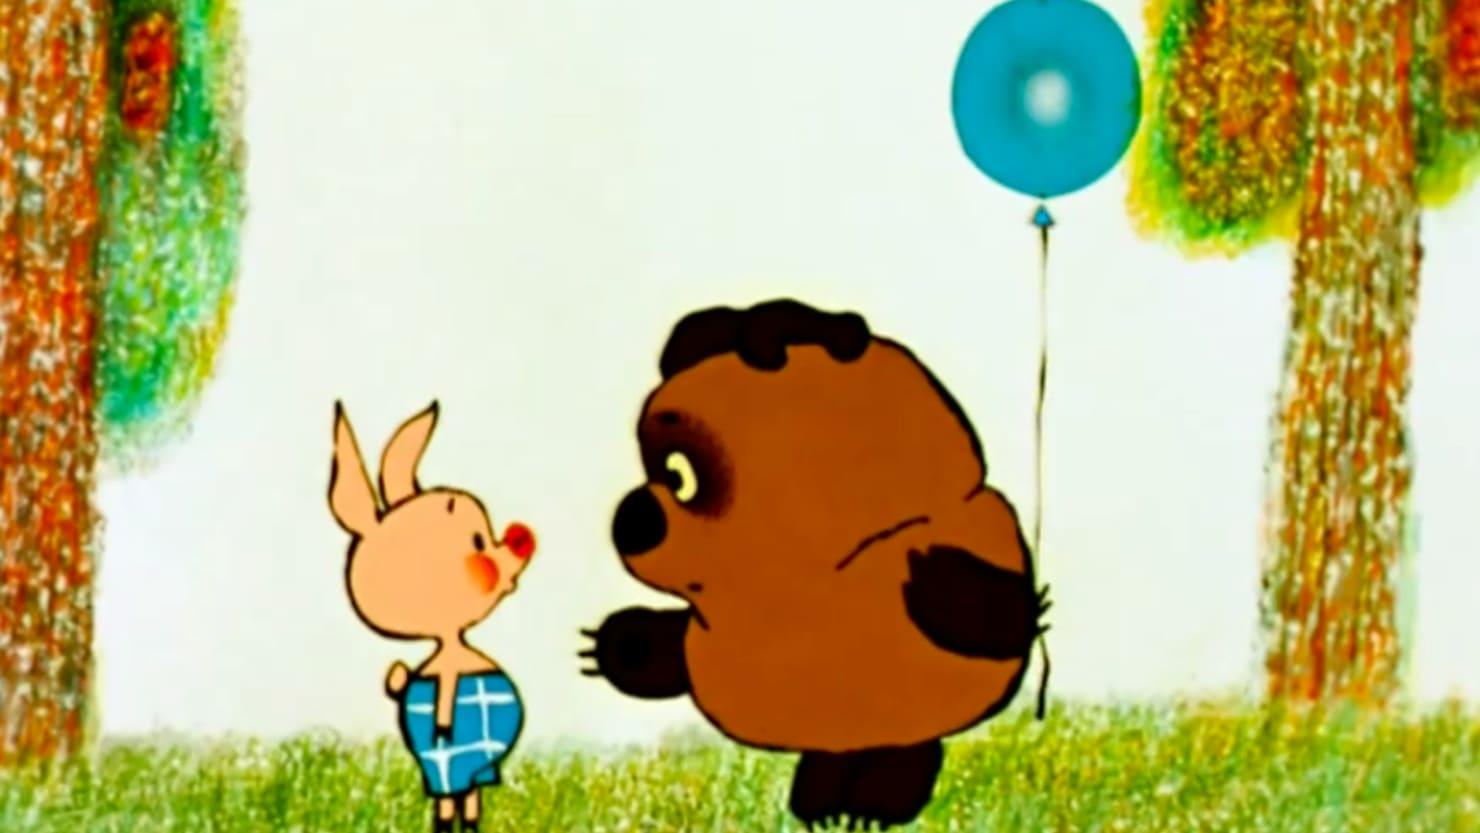 meet vinni pukh soviet russia s bizarre take on winnie the pooh